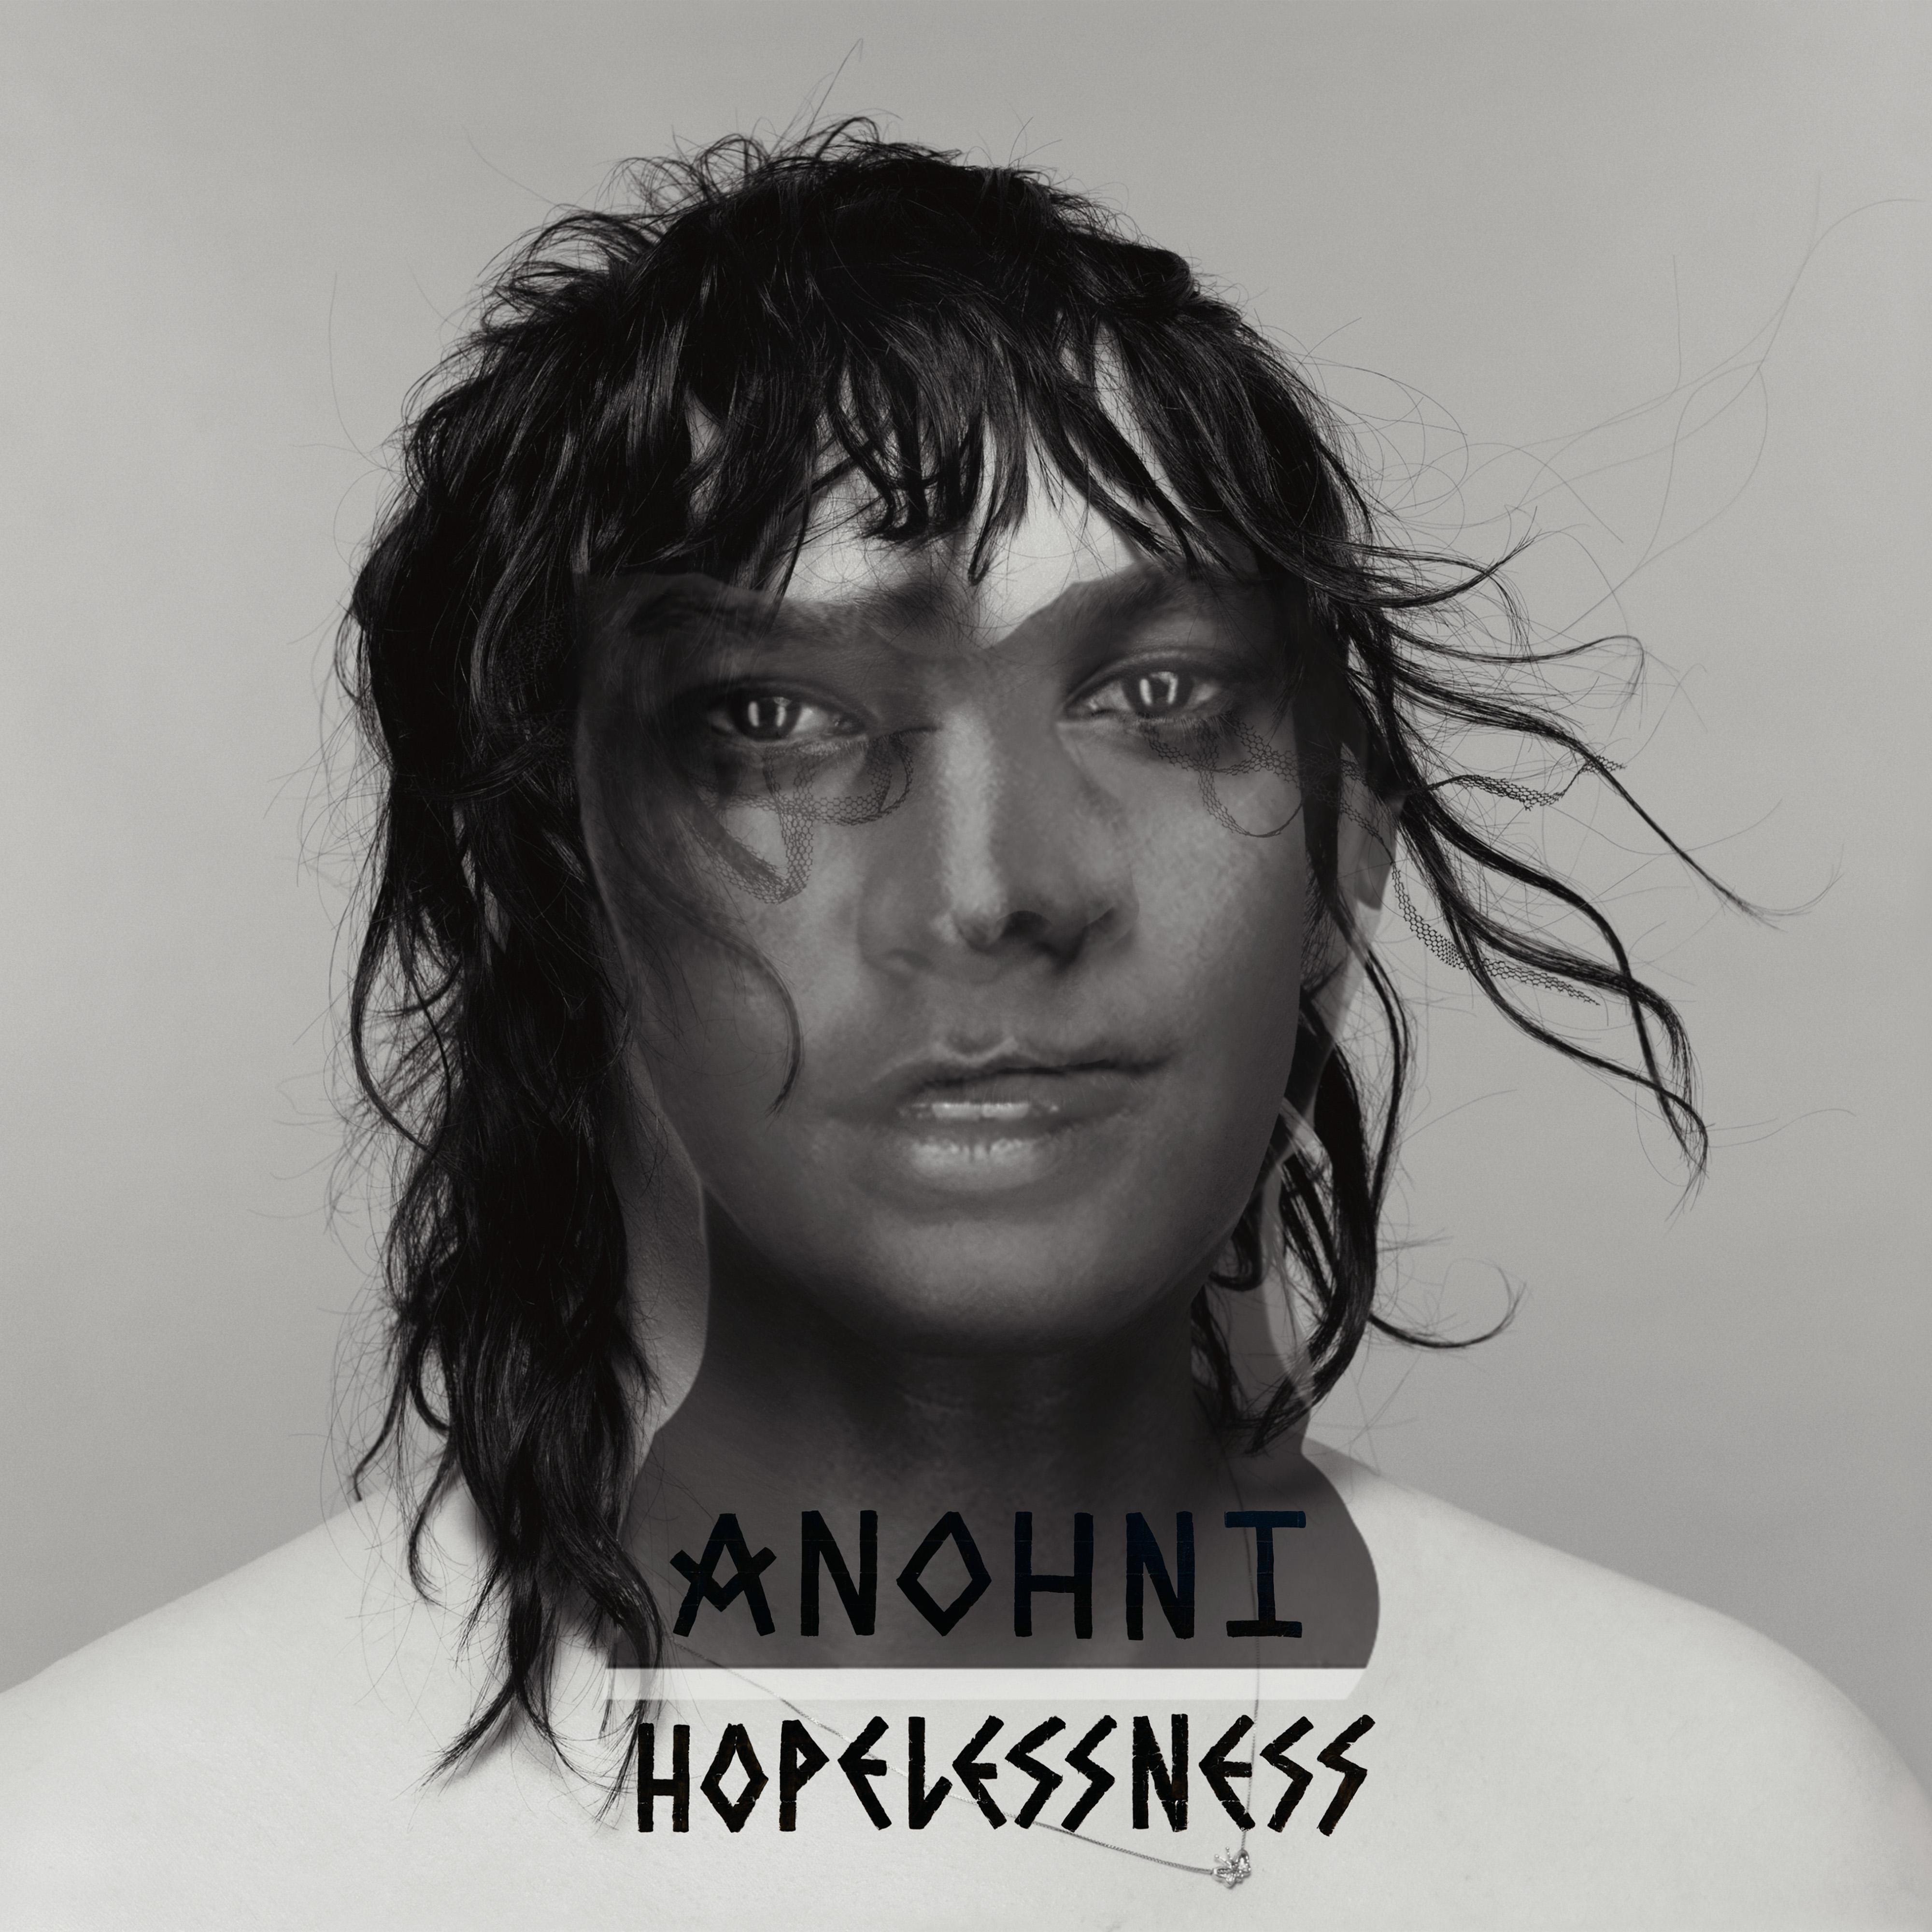 Anohni - HOPELESSNESS (VÖ: 6.5.)